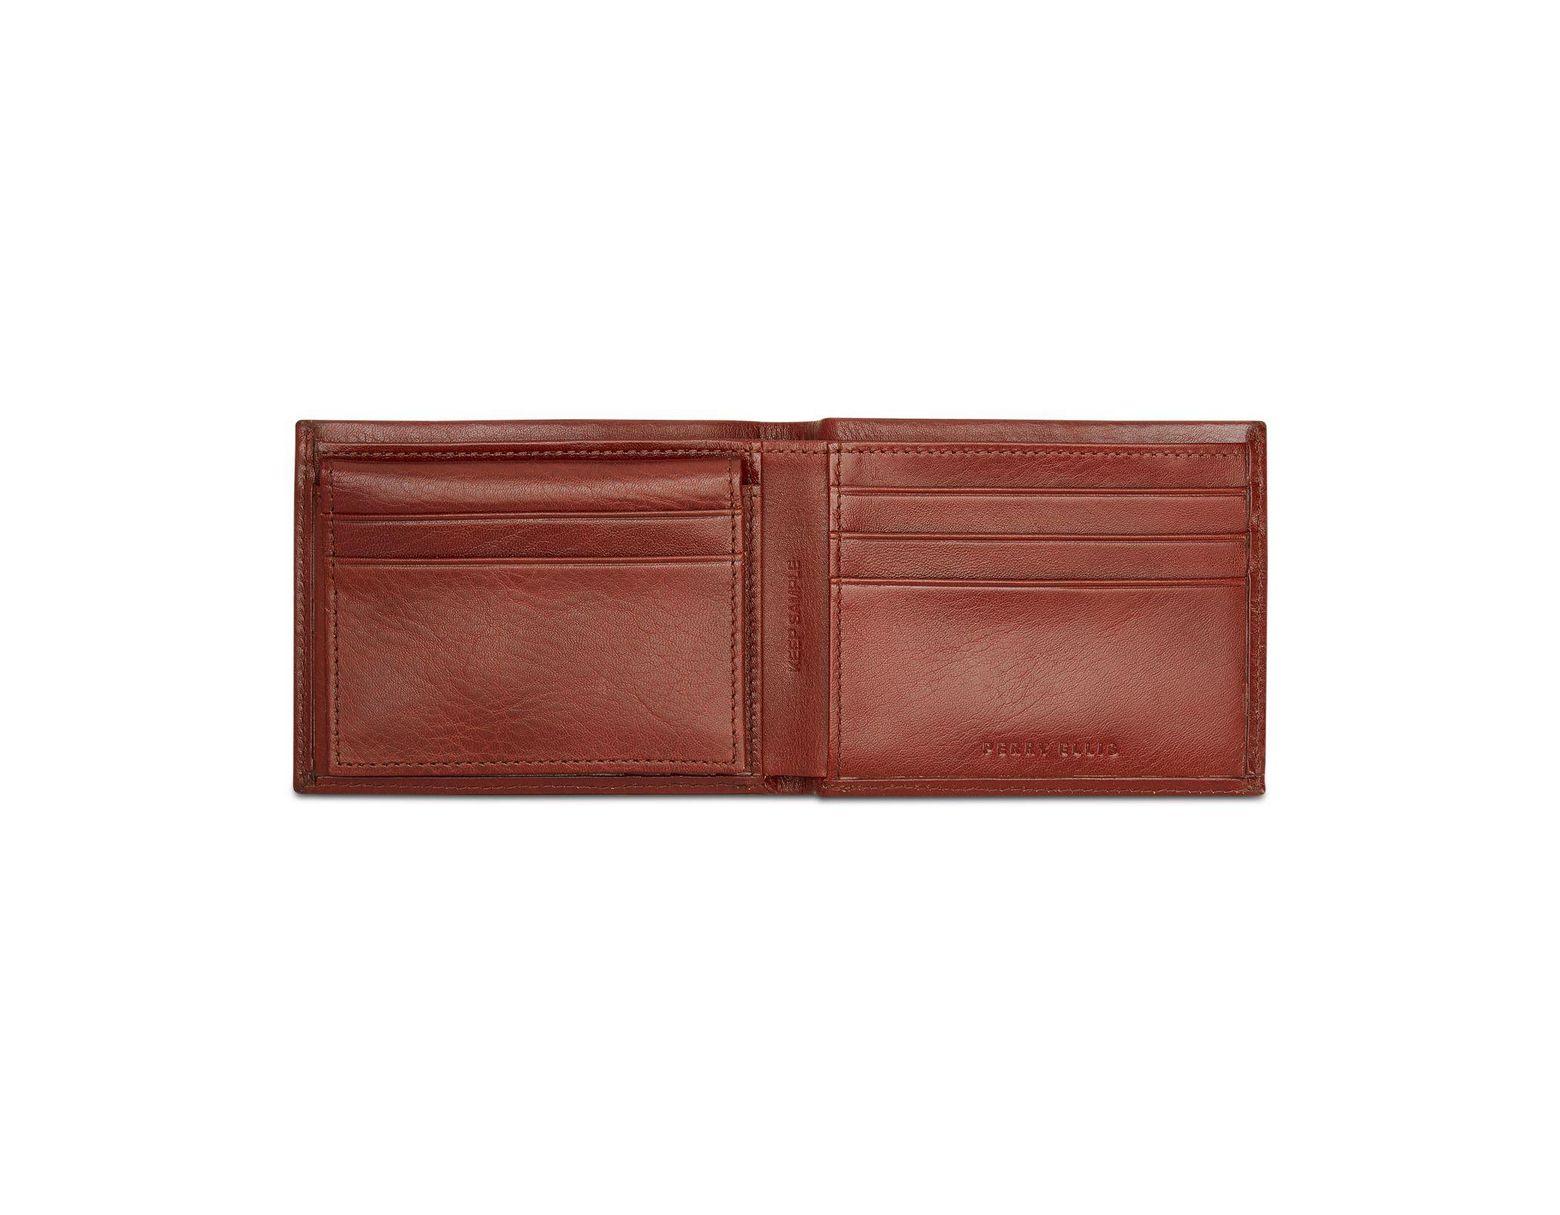 9508e93e9290 Perry Ellis Portfolio Leather Passcase & Removable Card Case for Men ...